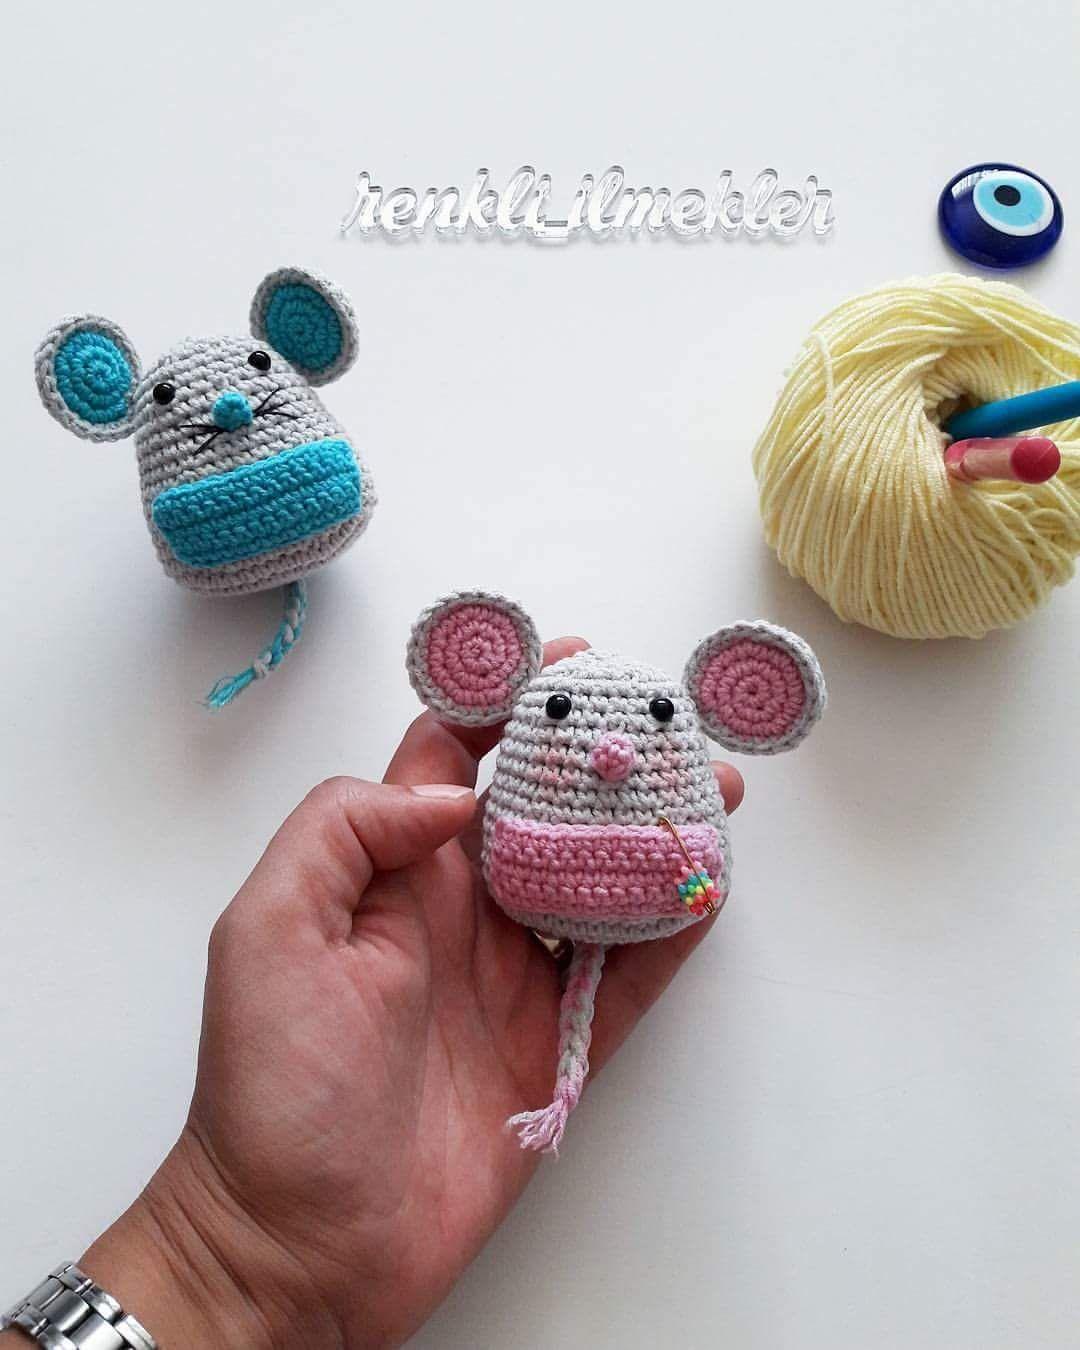 Amigurumi Keychain Mouse Free Pattern | Crochet keychain pattern ... | 1350x1080